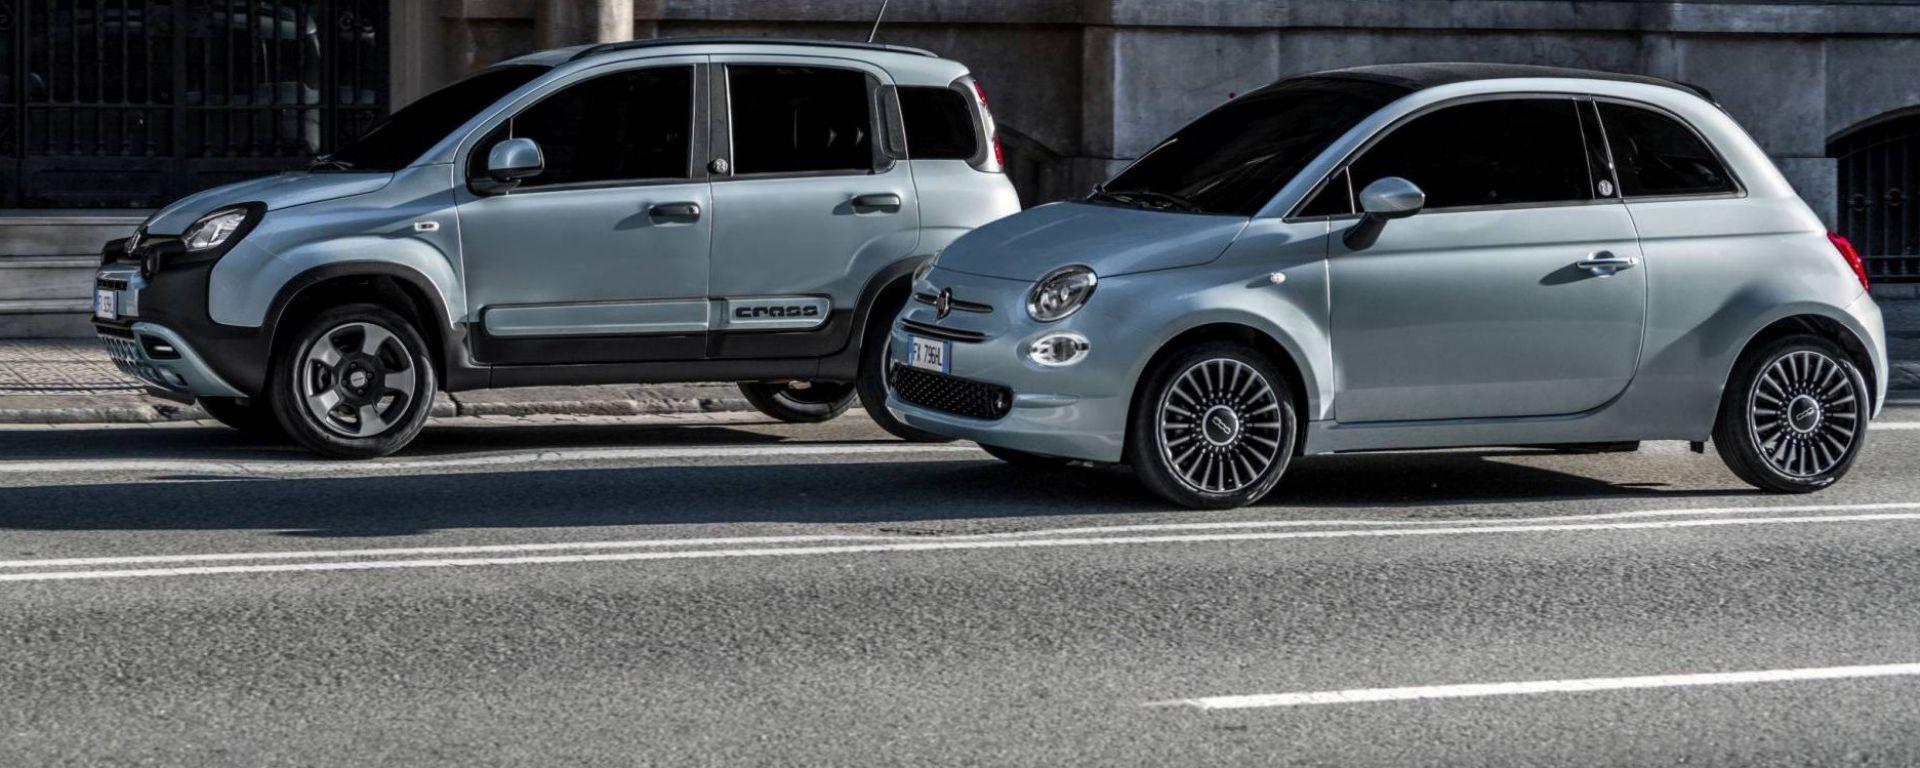 Fiat Panda e 500 Hybrid